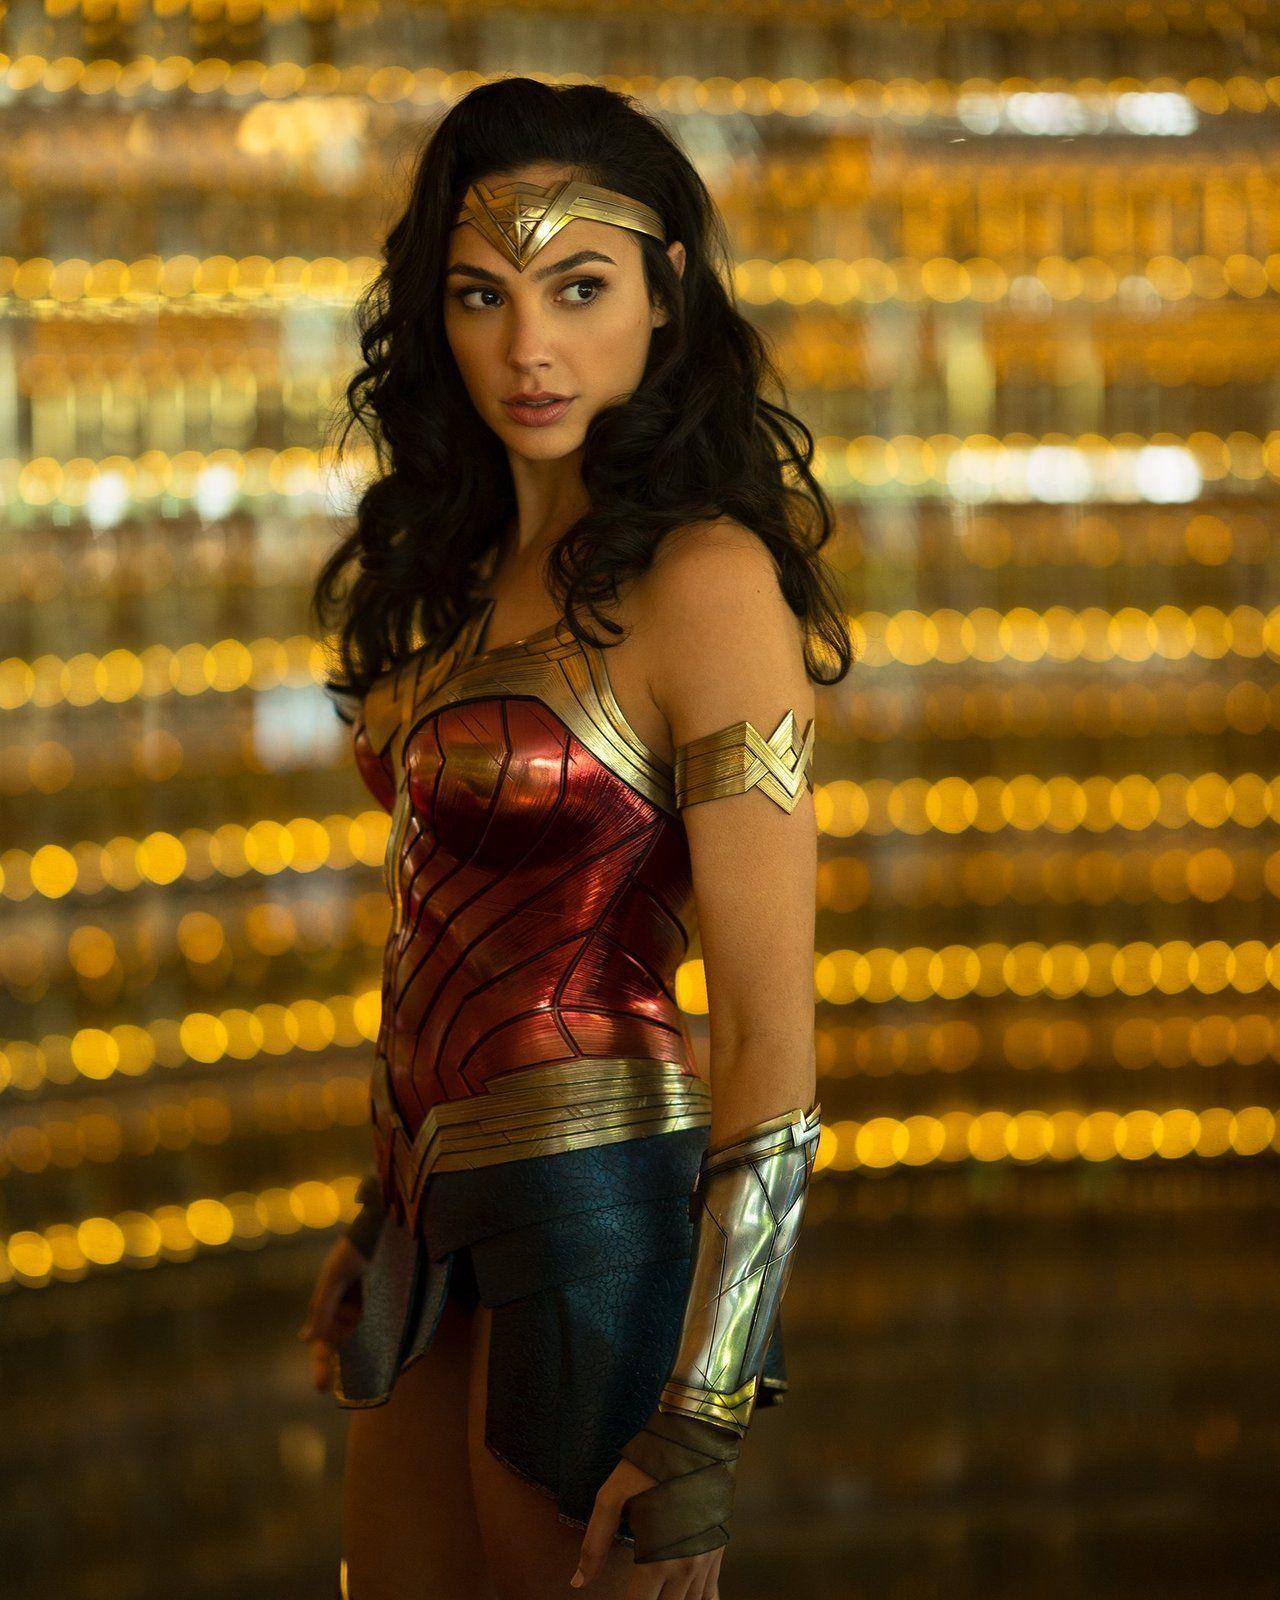 Israeli Gal Gadot As Wonder Woman Gal Gadot Wonder Woman Wonder Woman Movie Wonder Woman